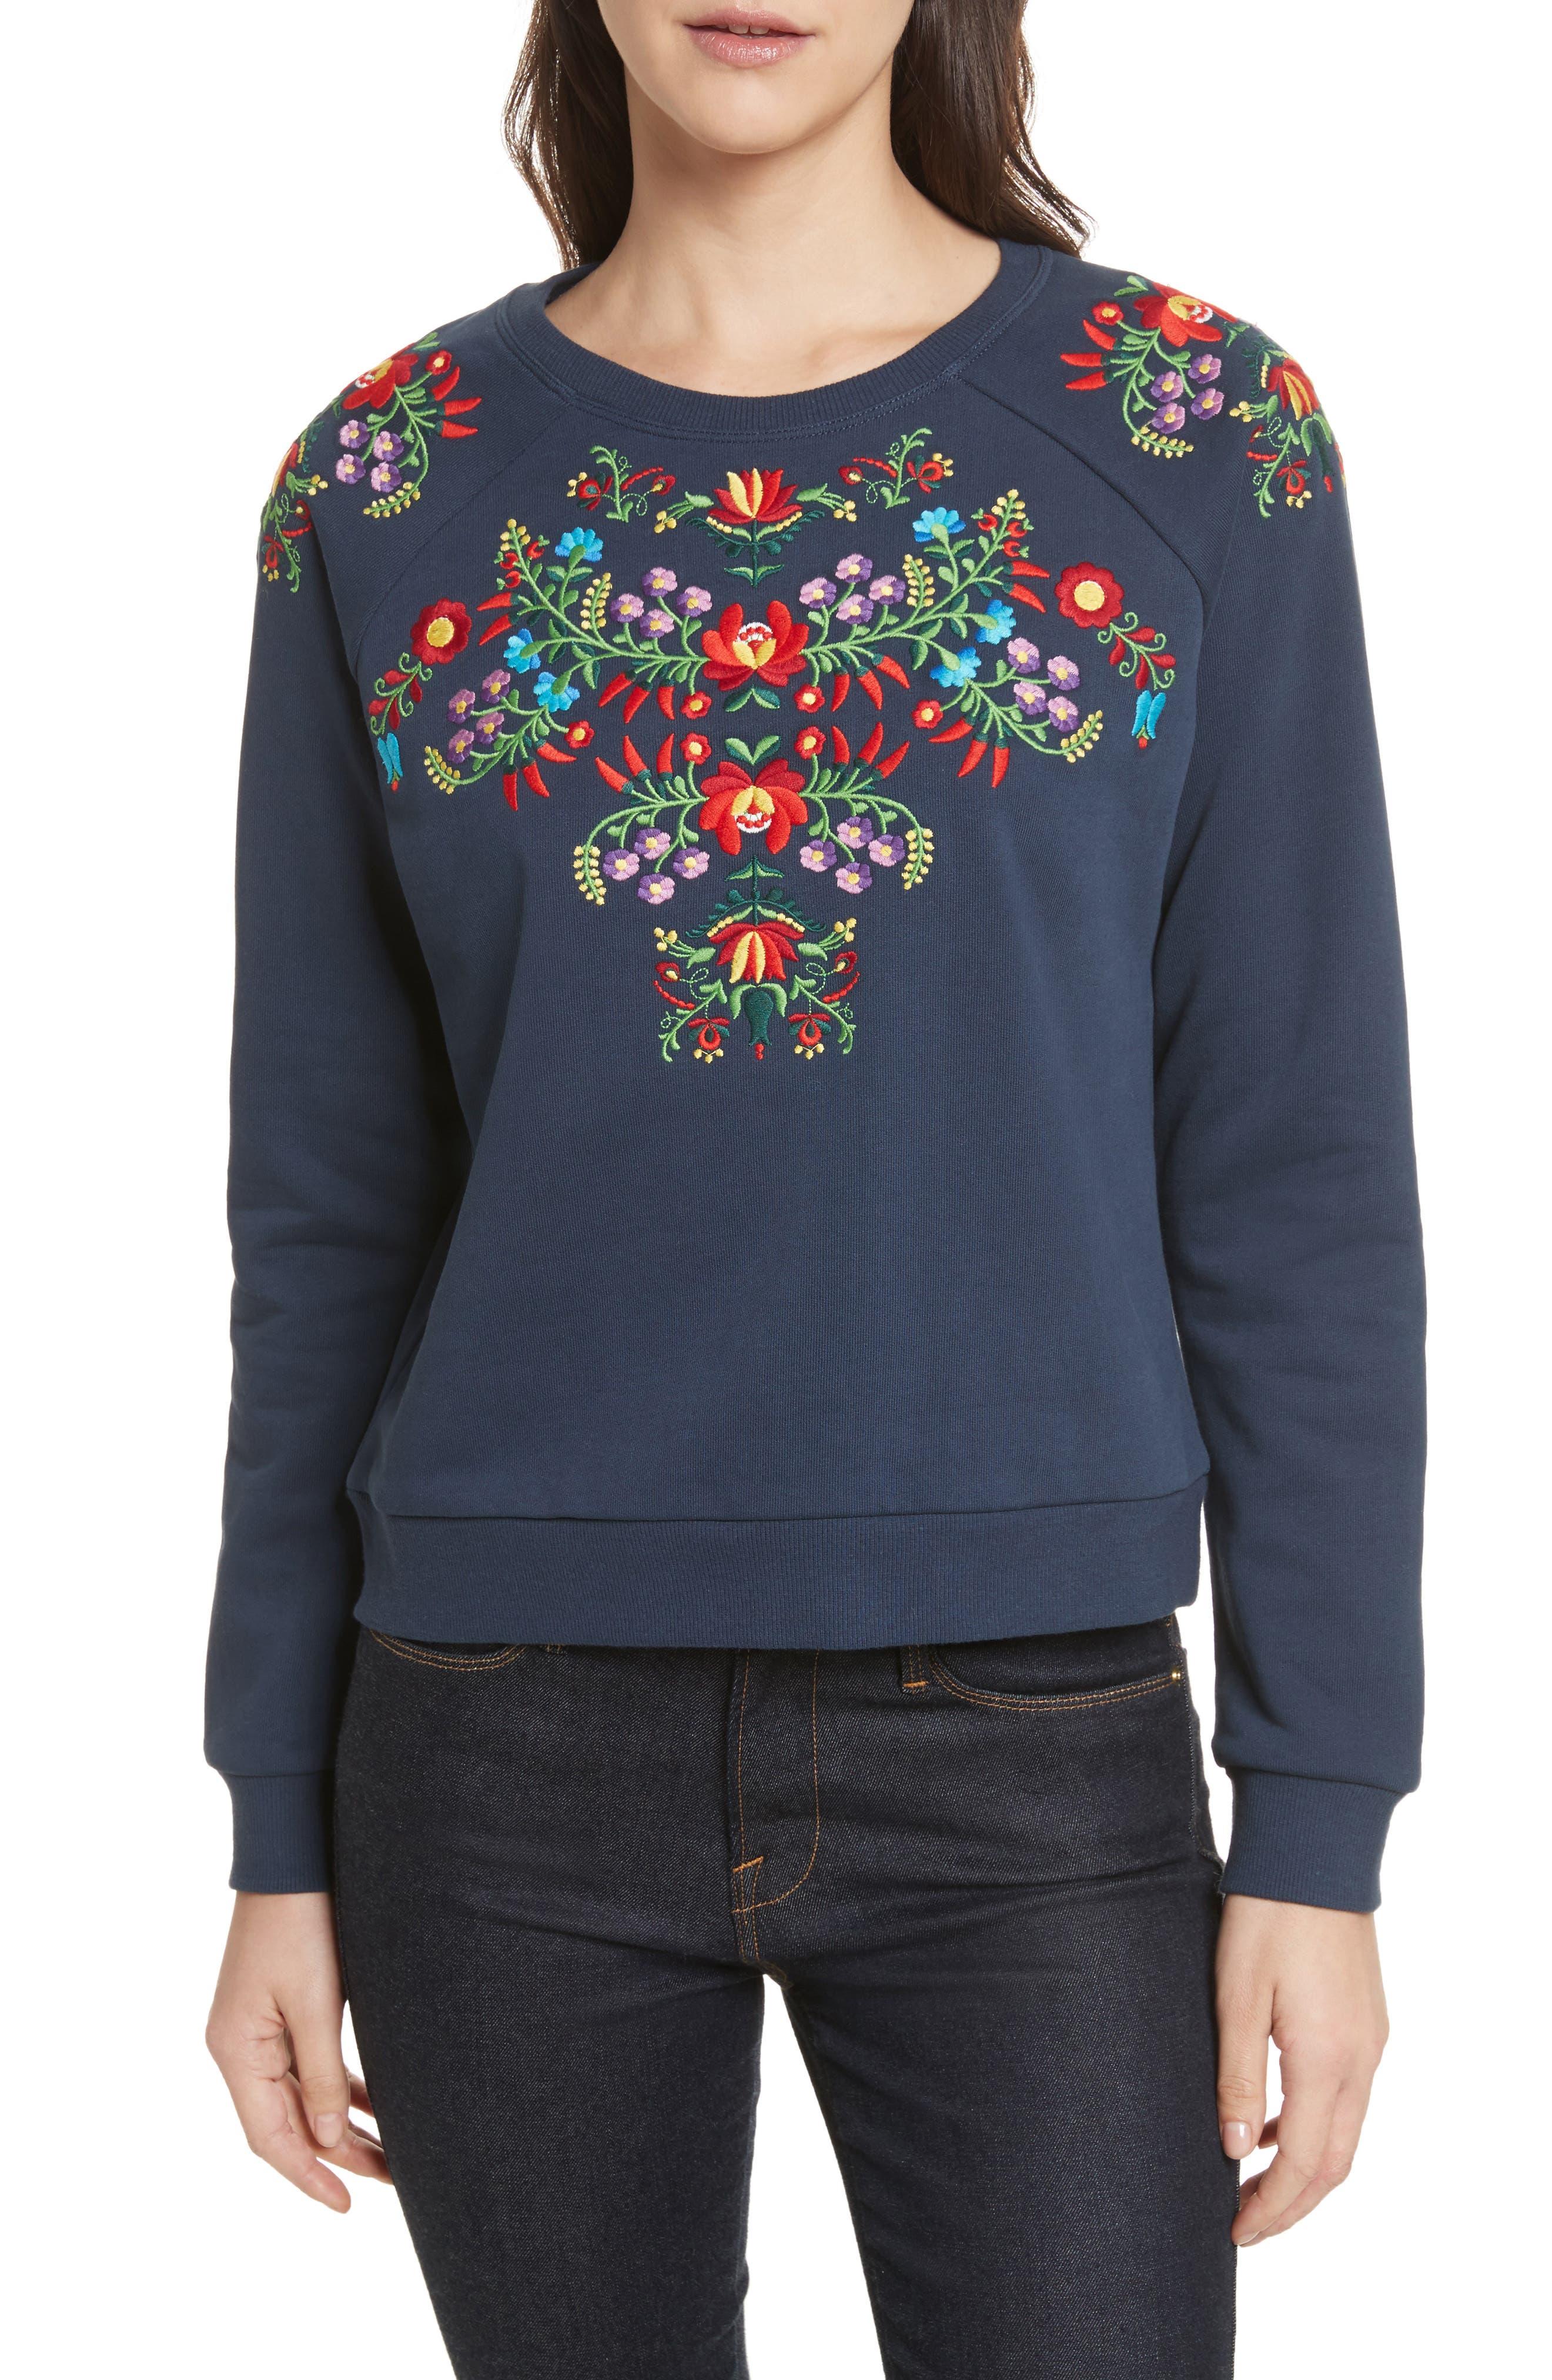 Rebecca Minkoff Jennings Sweatshirt